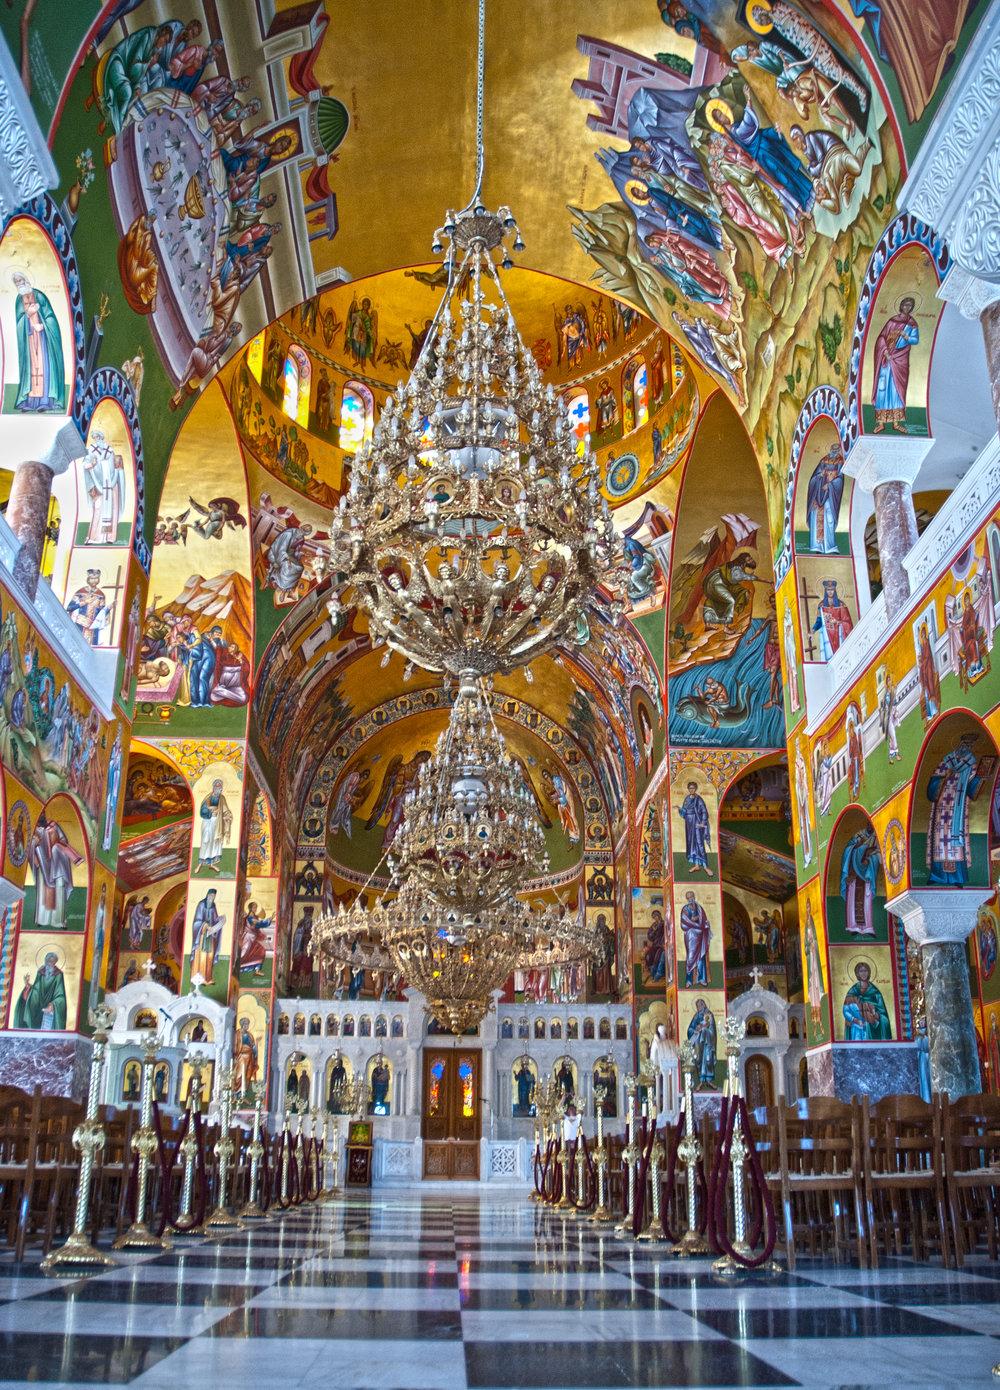 Church_interior,_Monastery_of_Agios_Gerassimos,_Kefalonia,_Greece.jpg